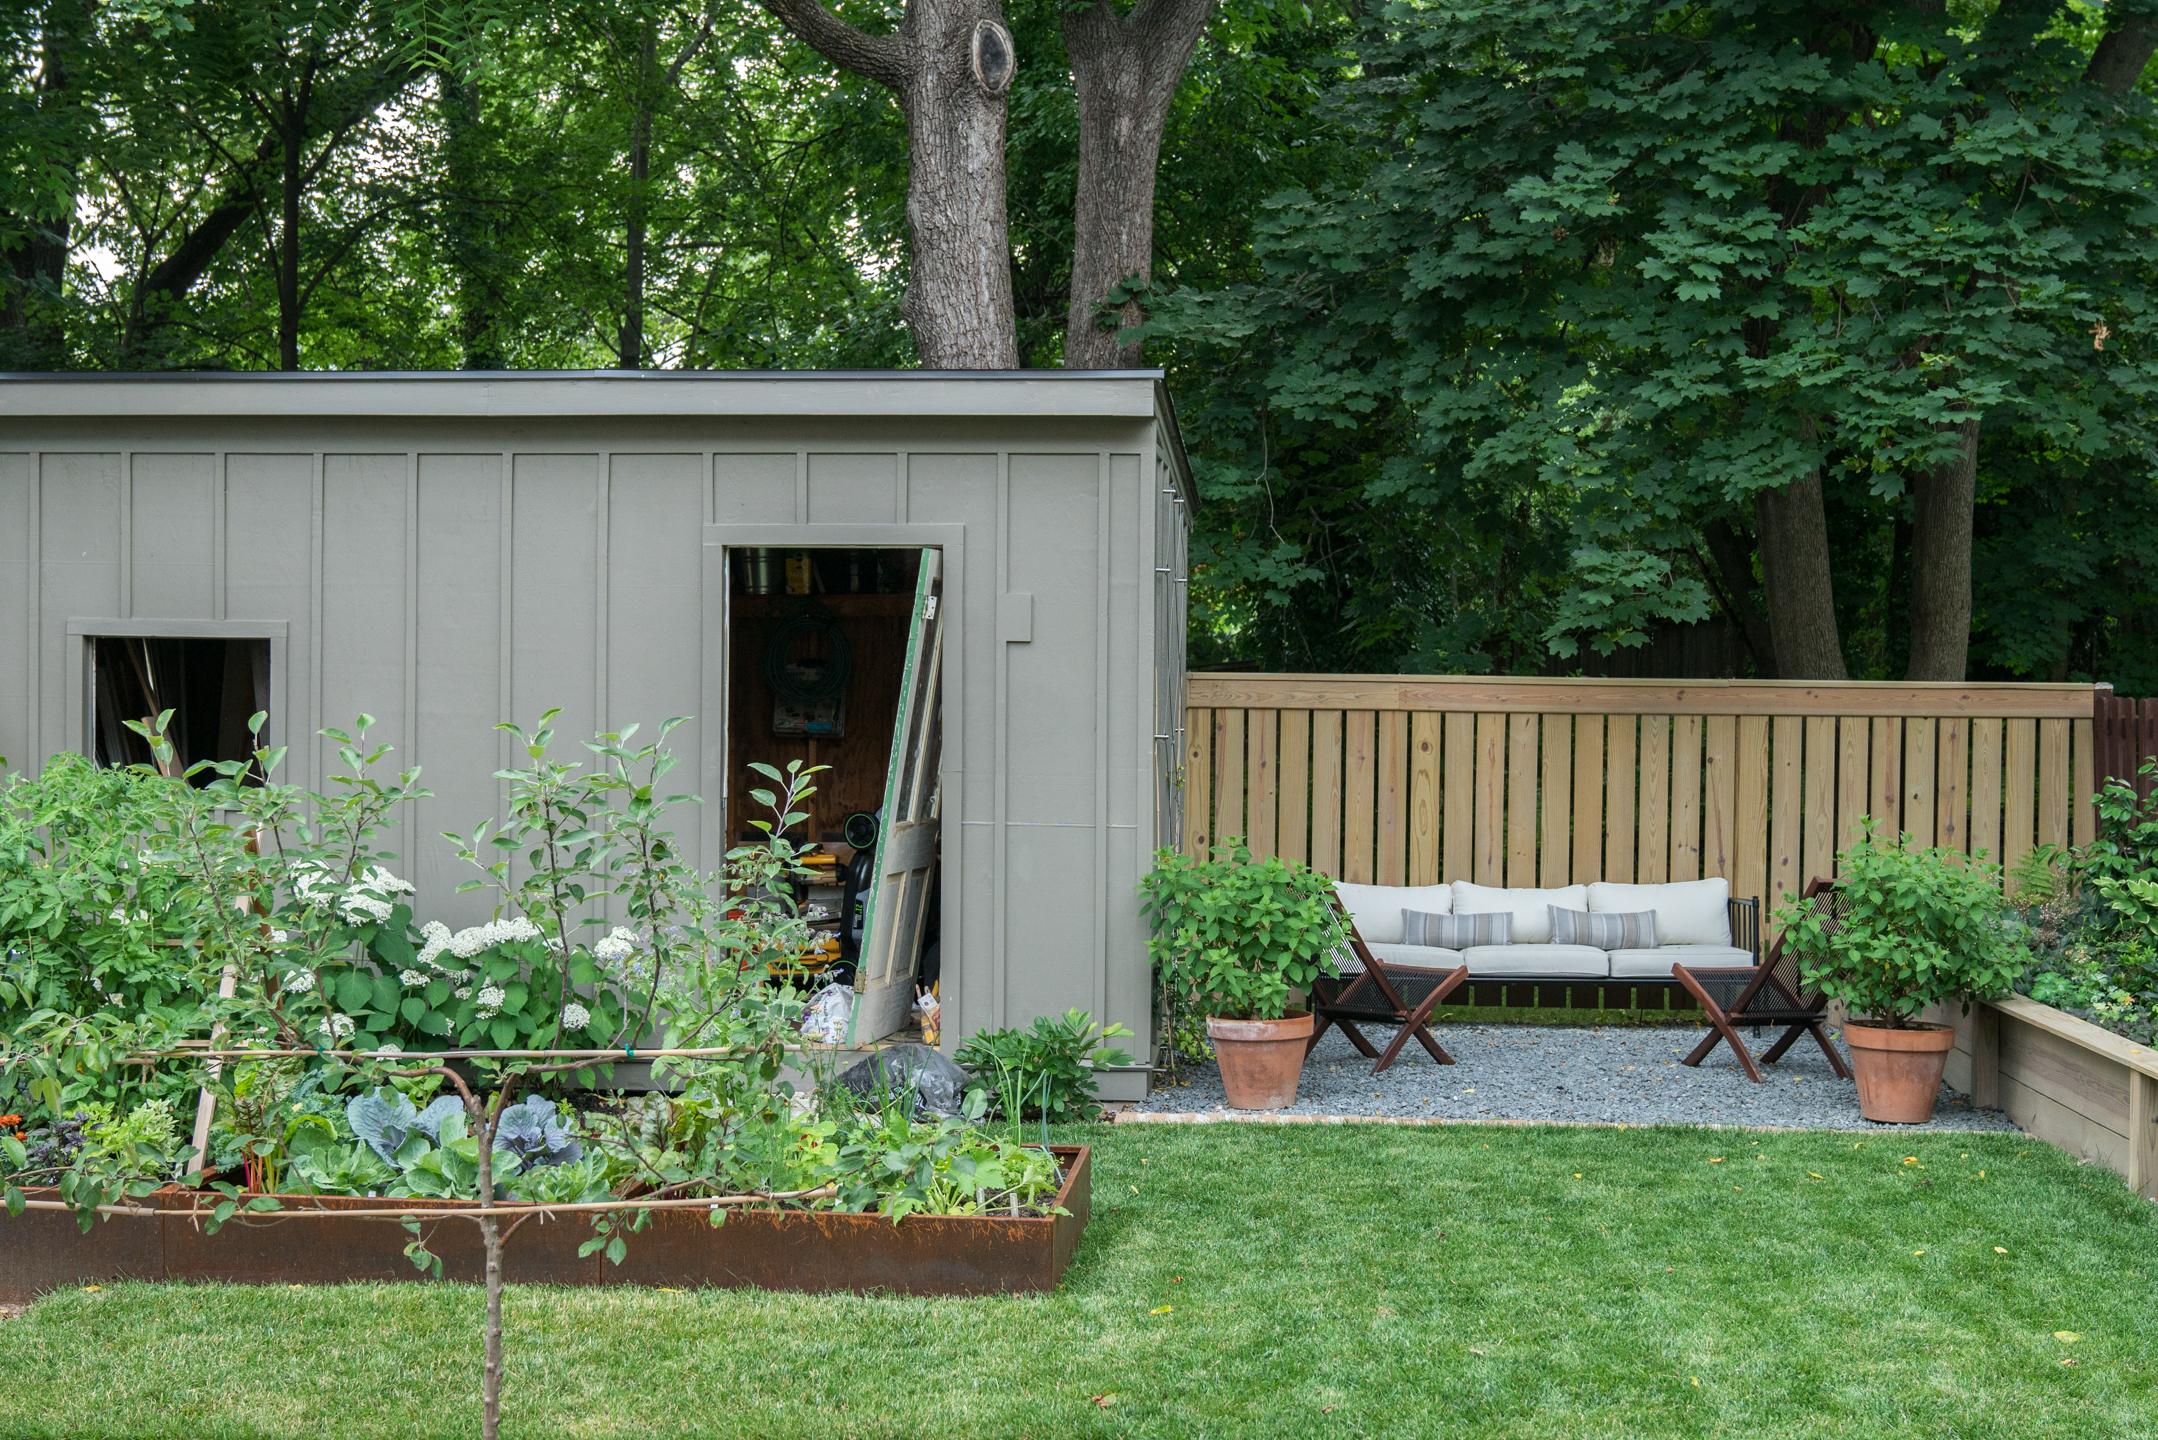 Backyard Renovations: A Major Overhaul in 3 Months